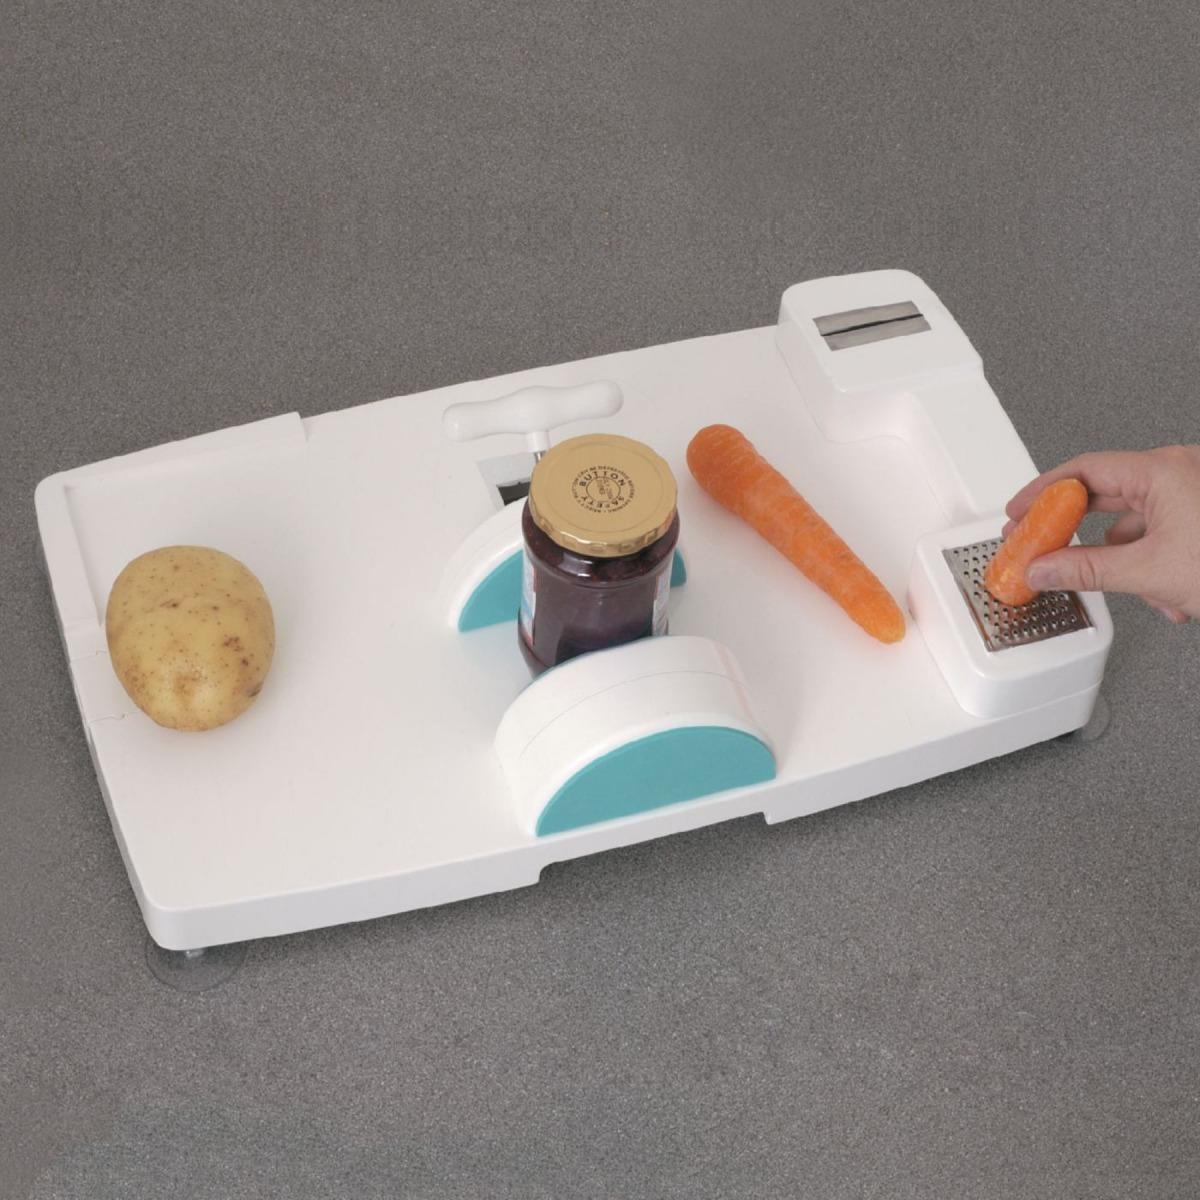 Adaptive Kitchen Workstation